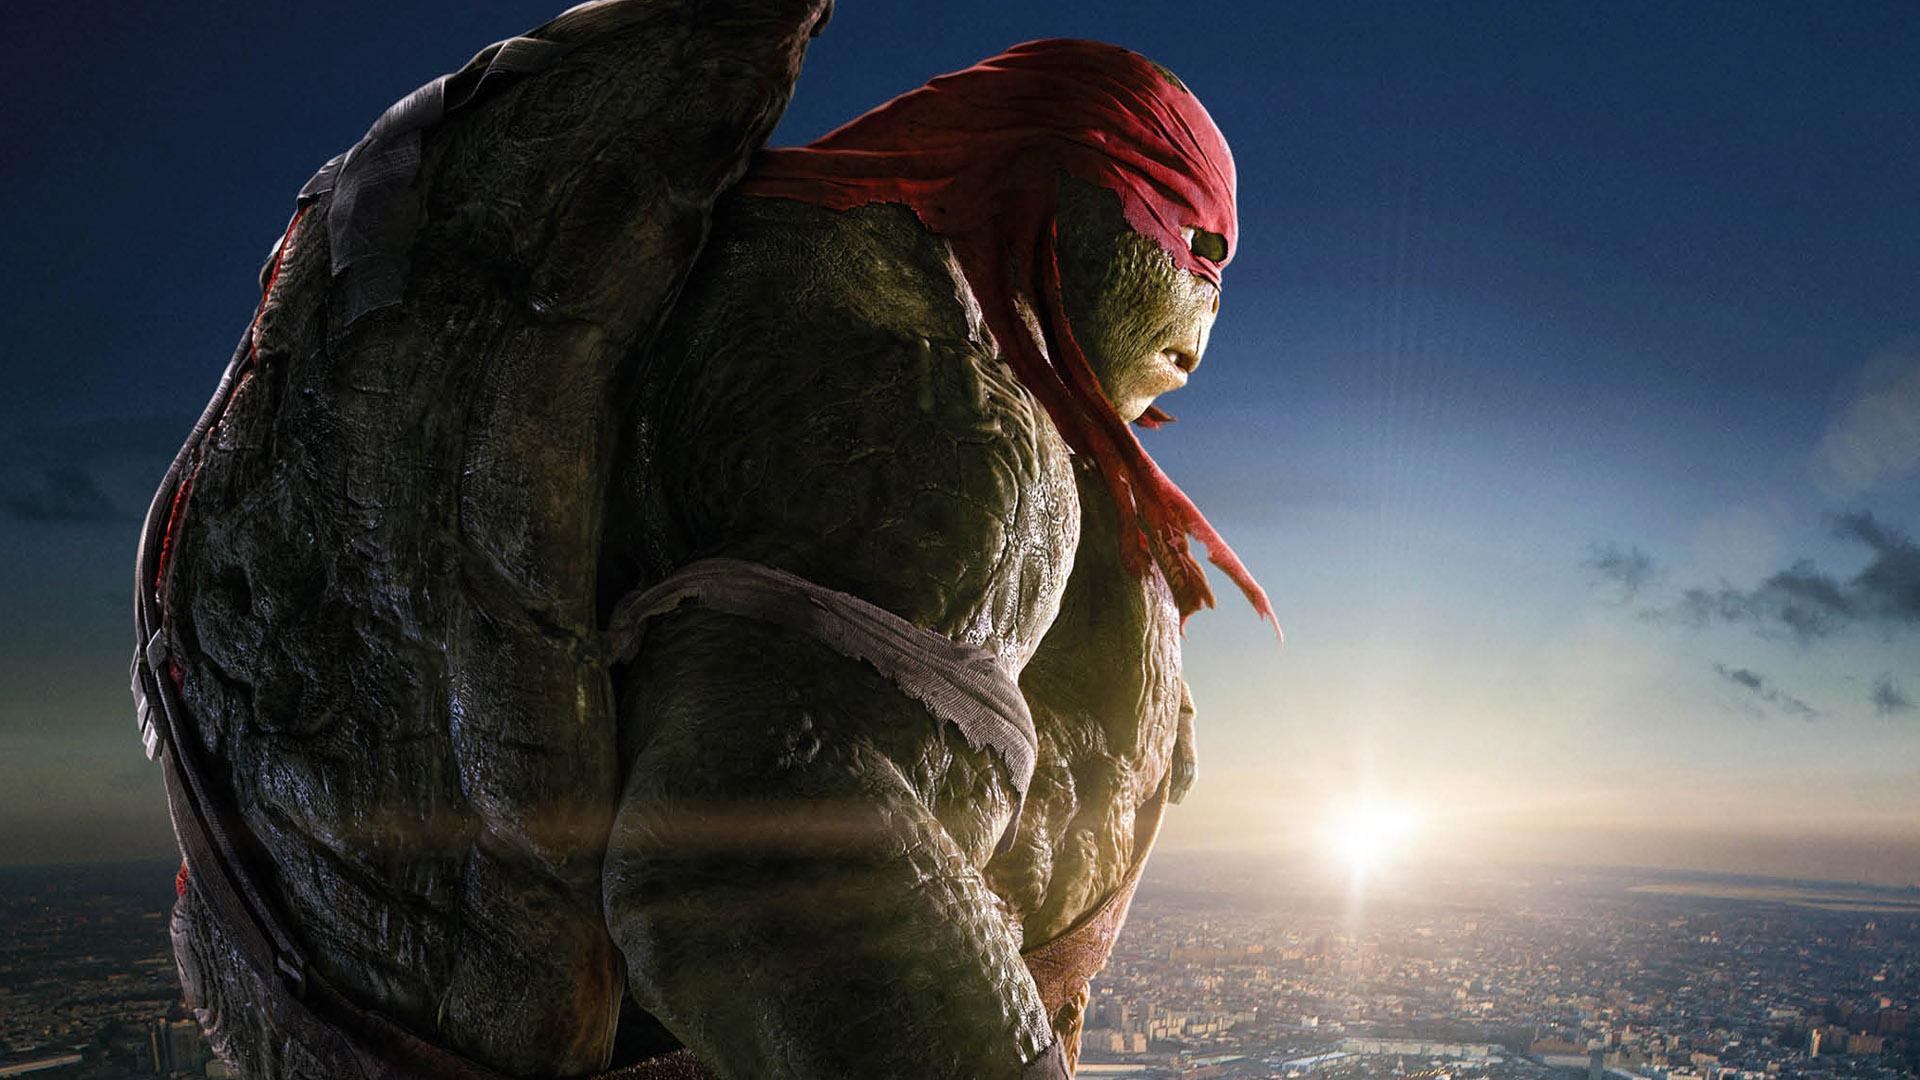 Teenage Mutant Ninja Turtles 2014 Mini Review Flicks And Pieces